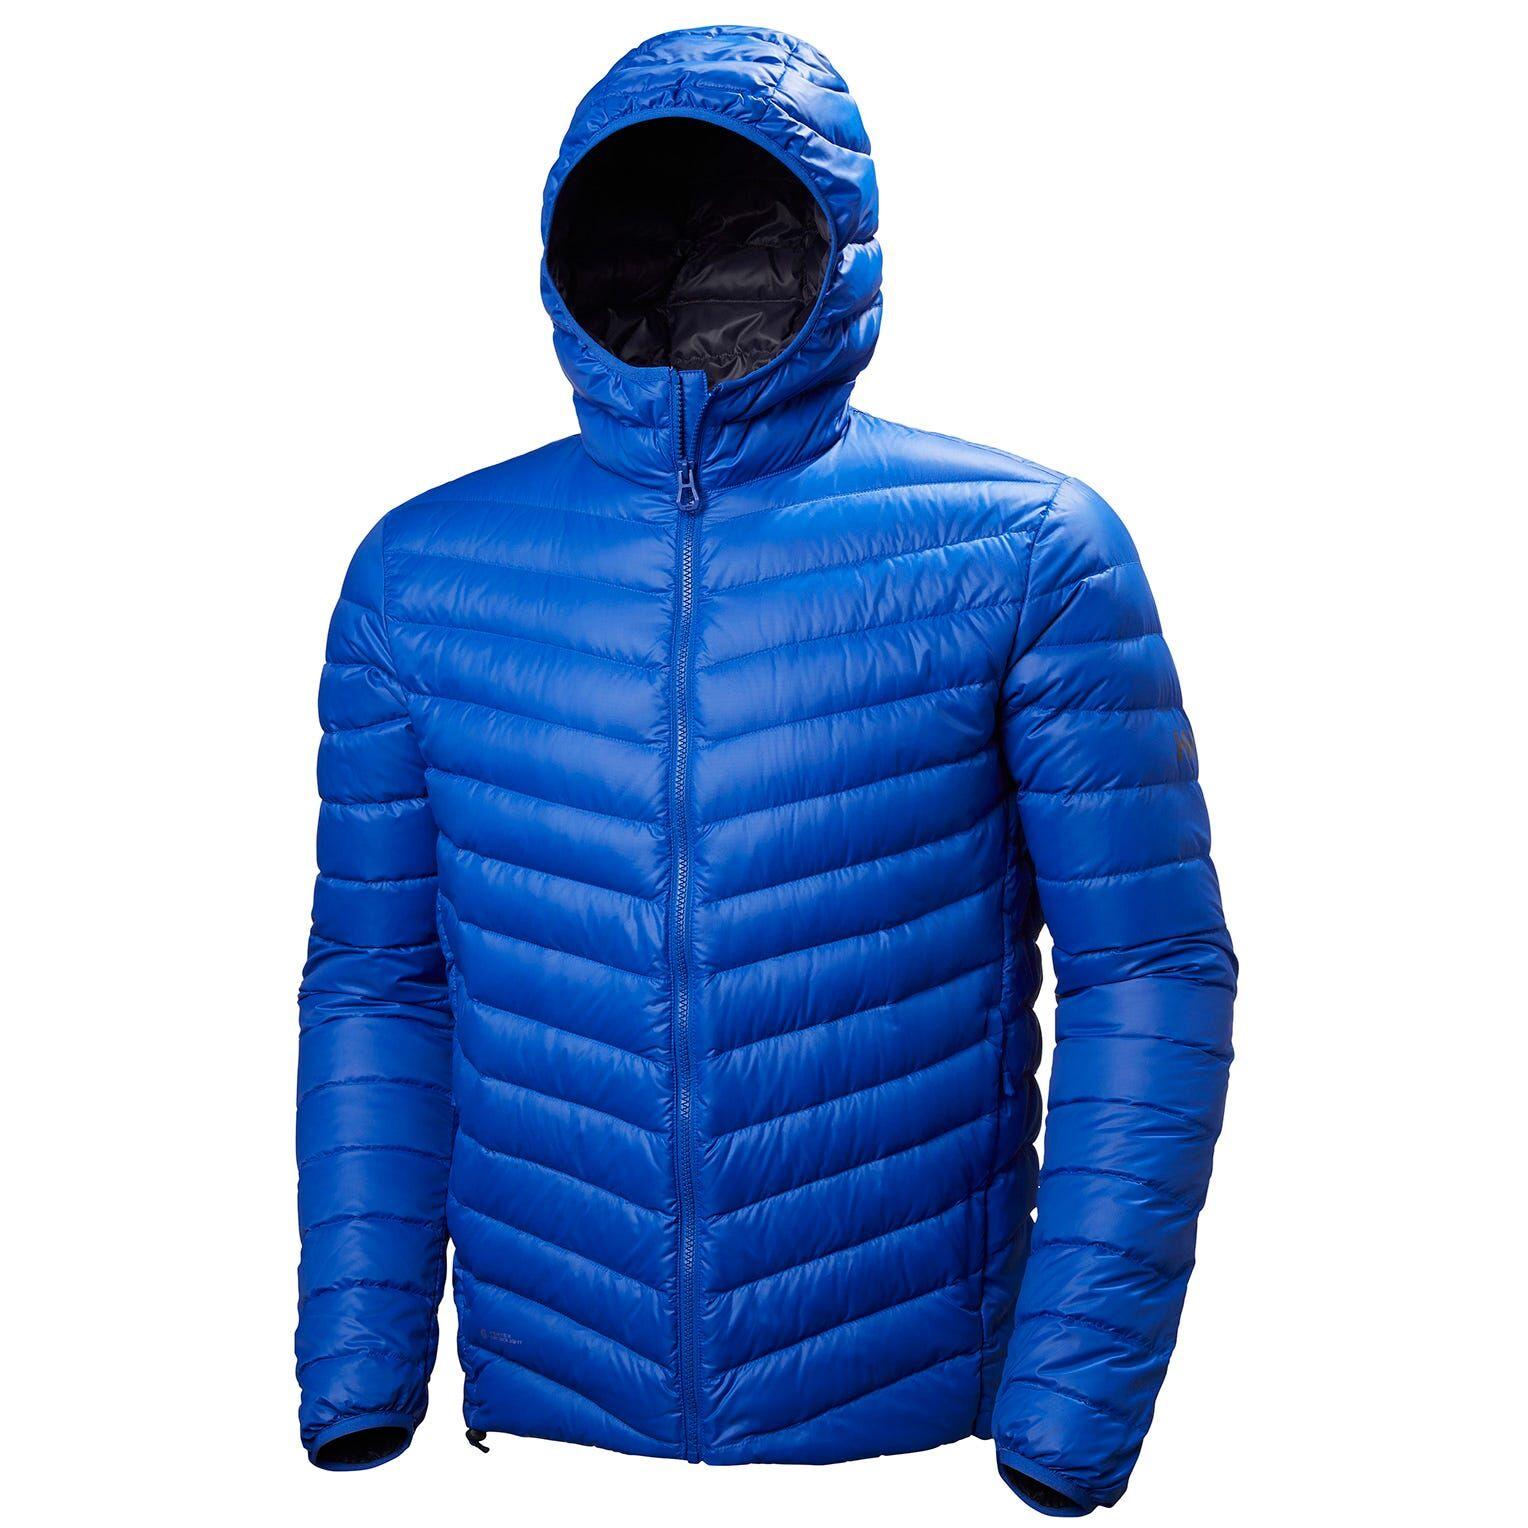 Helly Hansen Verglas Hooded Down Insulator Mens Hiking Jacket Blue L